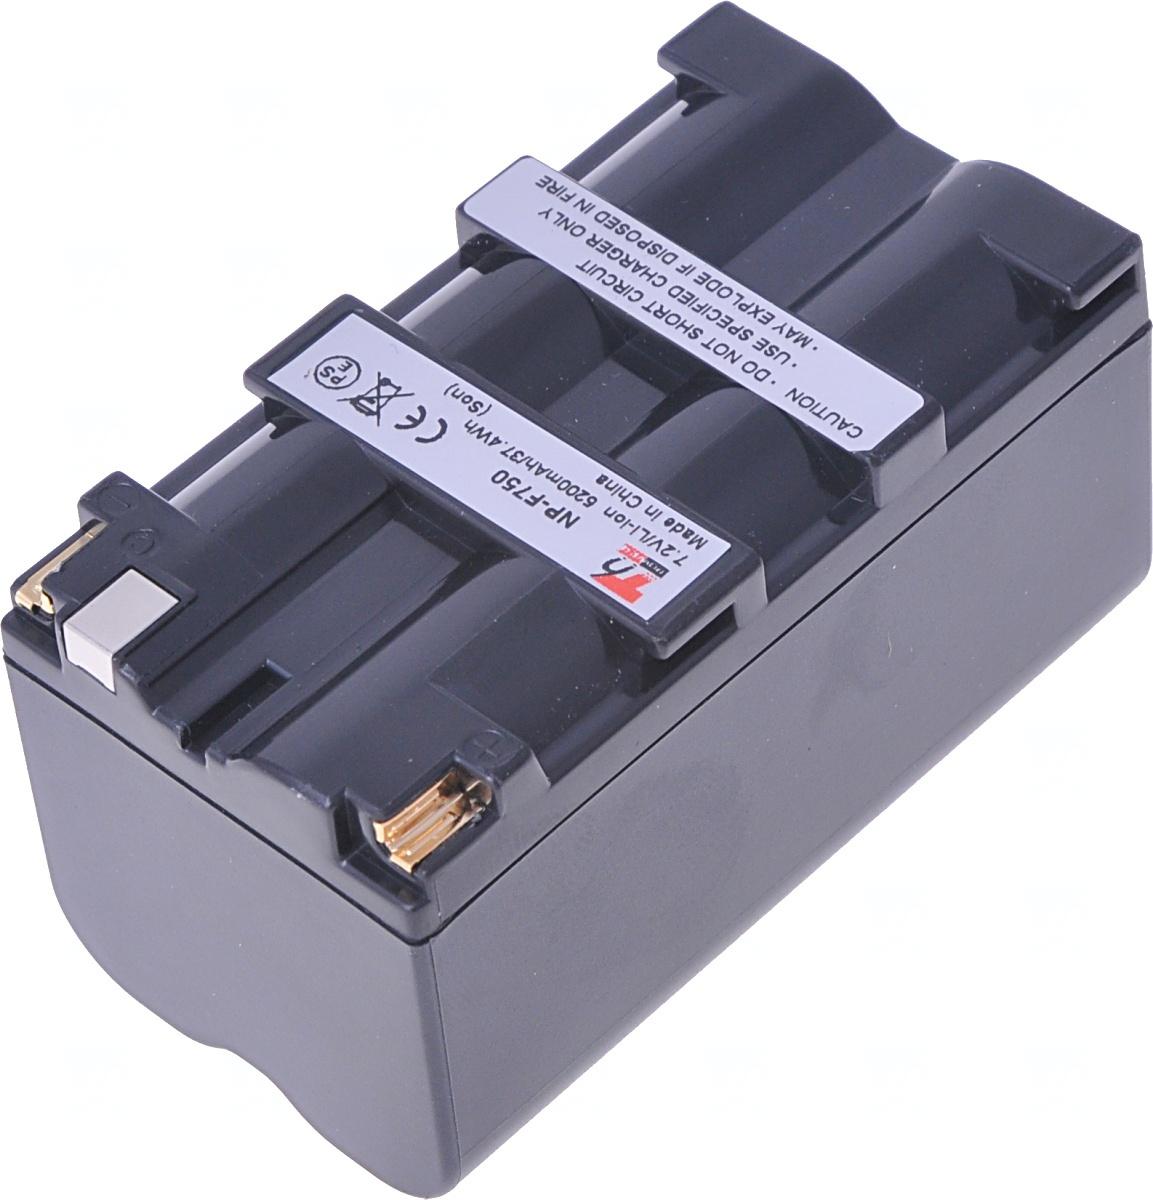 Baterie T6 power Sony NP-F750, NP-F730H, NP-F730, NP-F770, 5200mAh, 37,4Wh, šedá